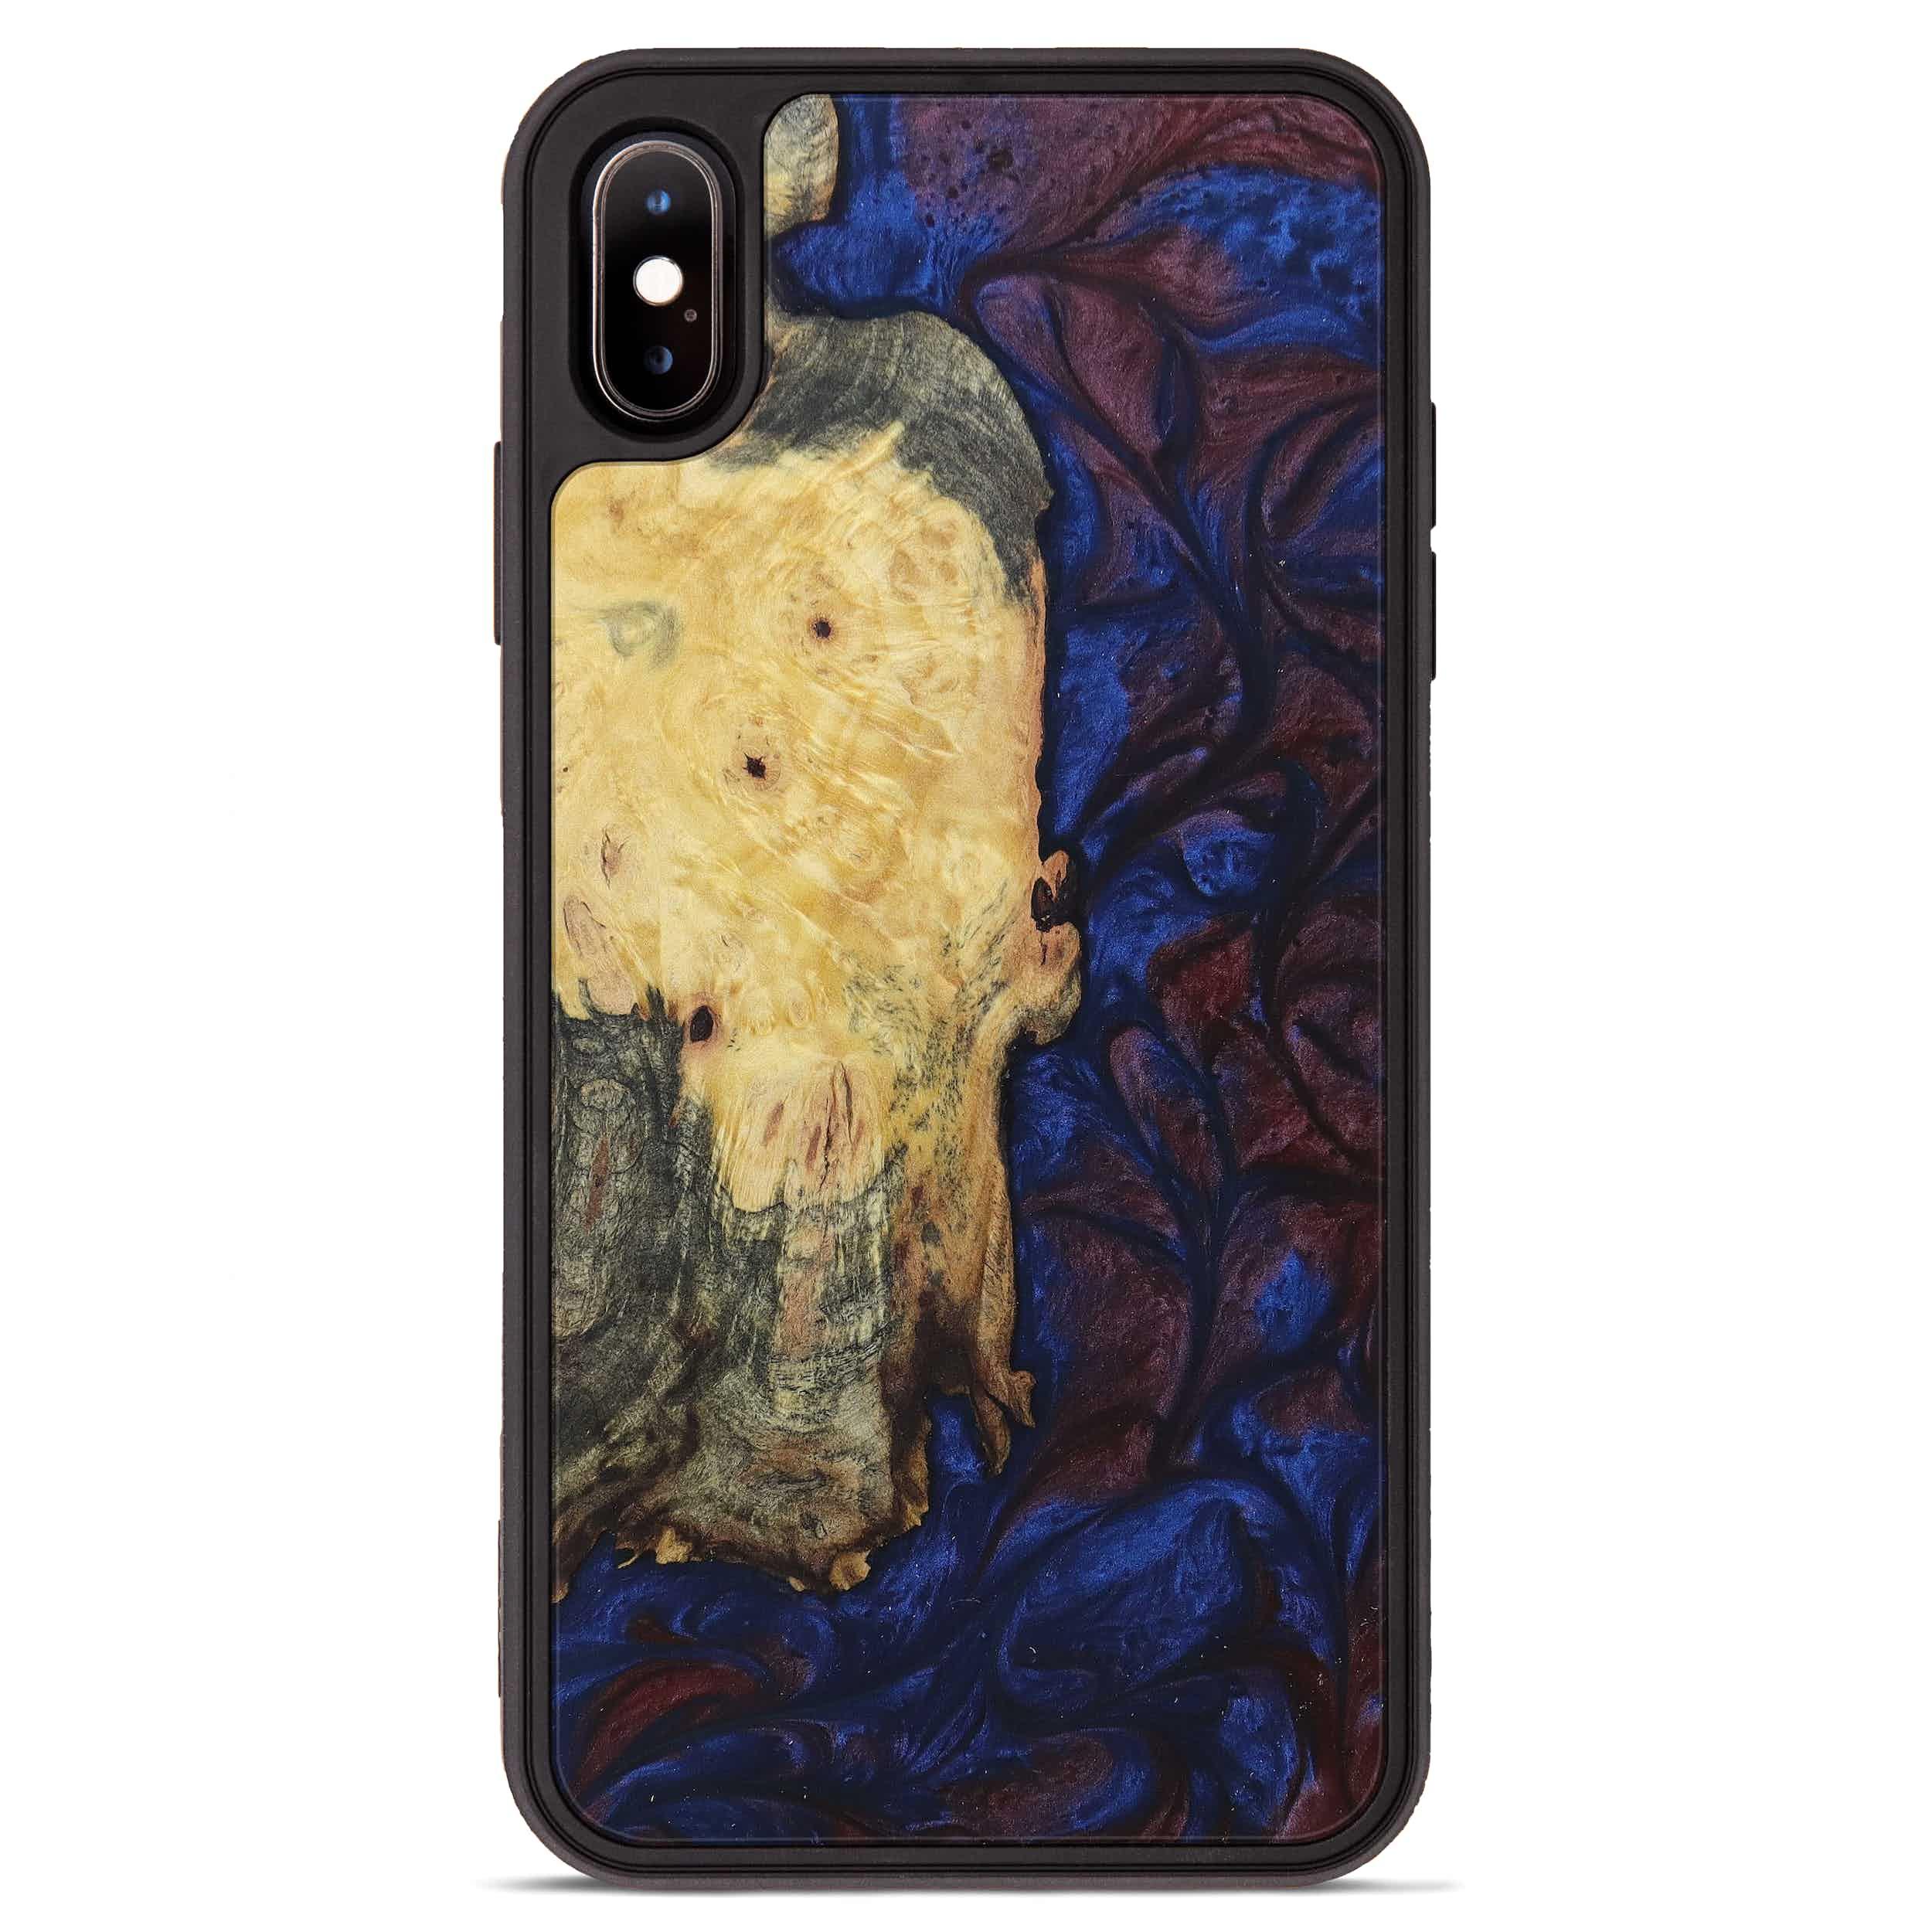 iPhone Xs Max Wood+Resin Phone Case - Balakrishna (Blue & Red, 394787)